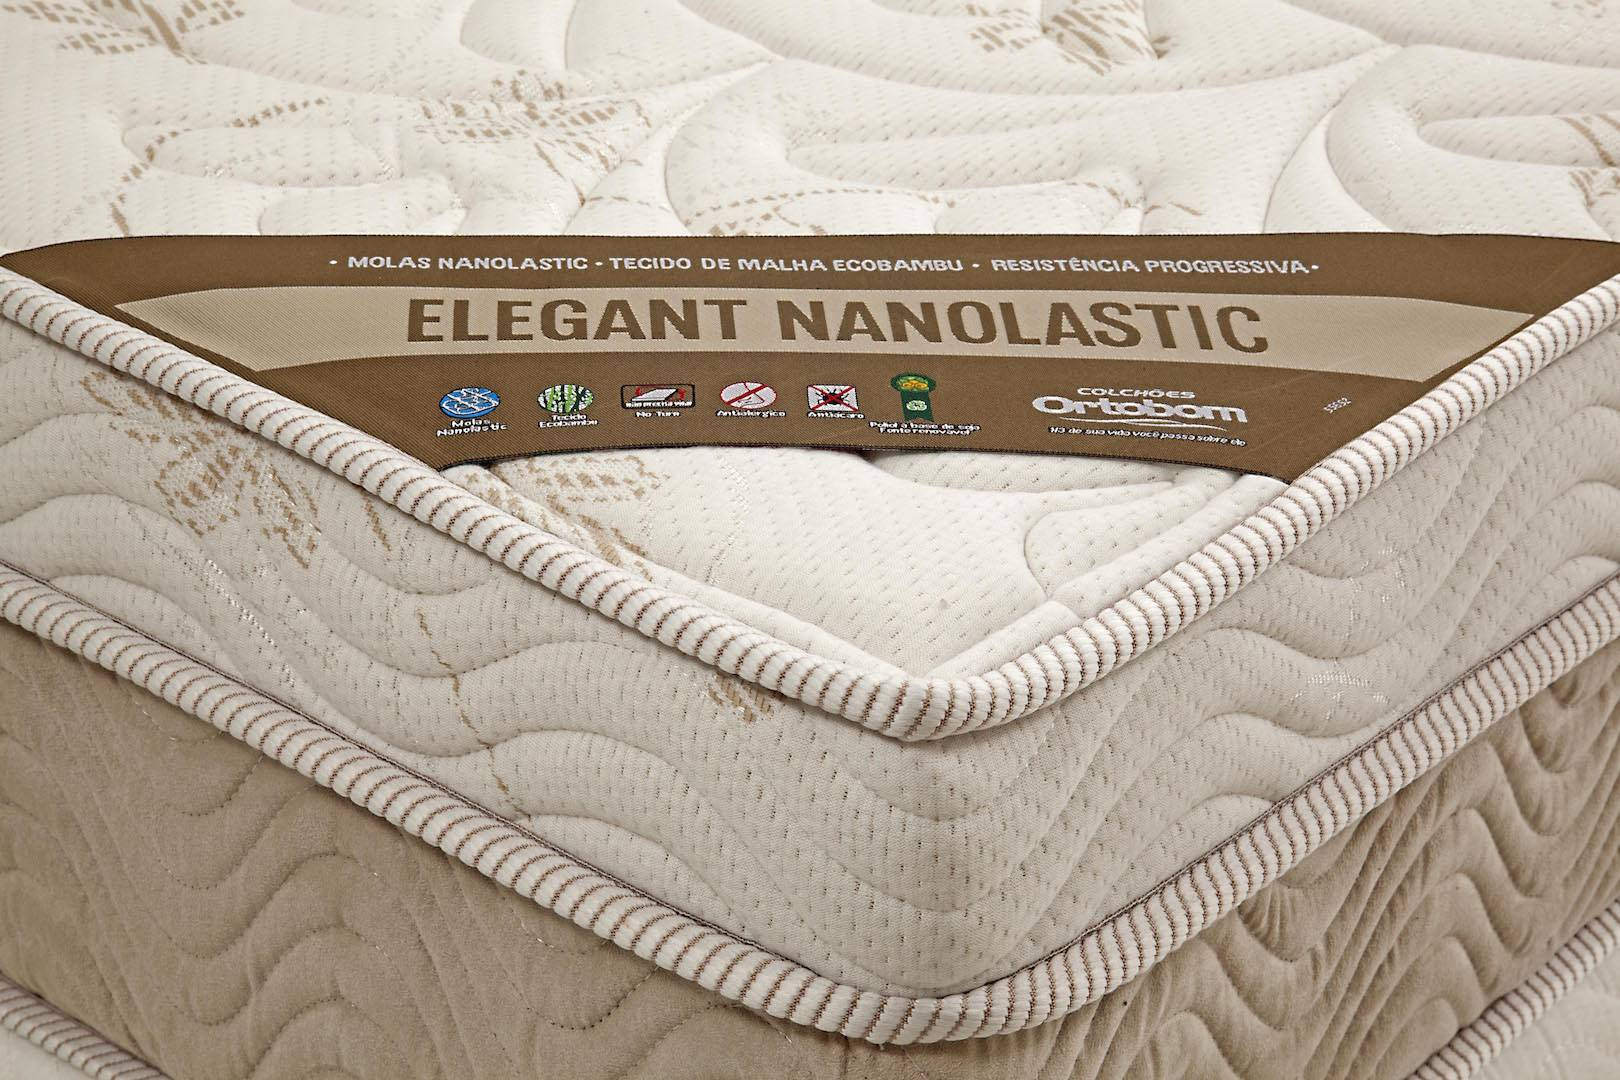 Colchao Elegant Nanolastic Queen 158 cm (LARG) Creme e Branco - 42566